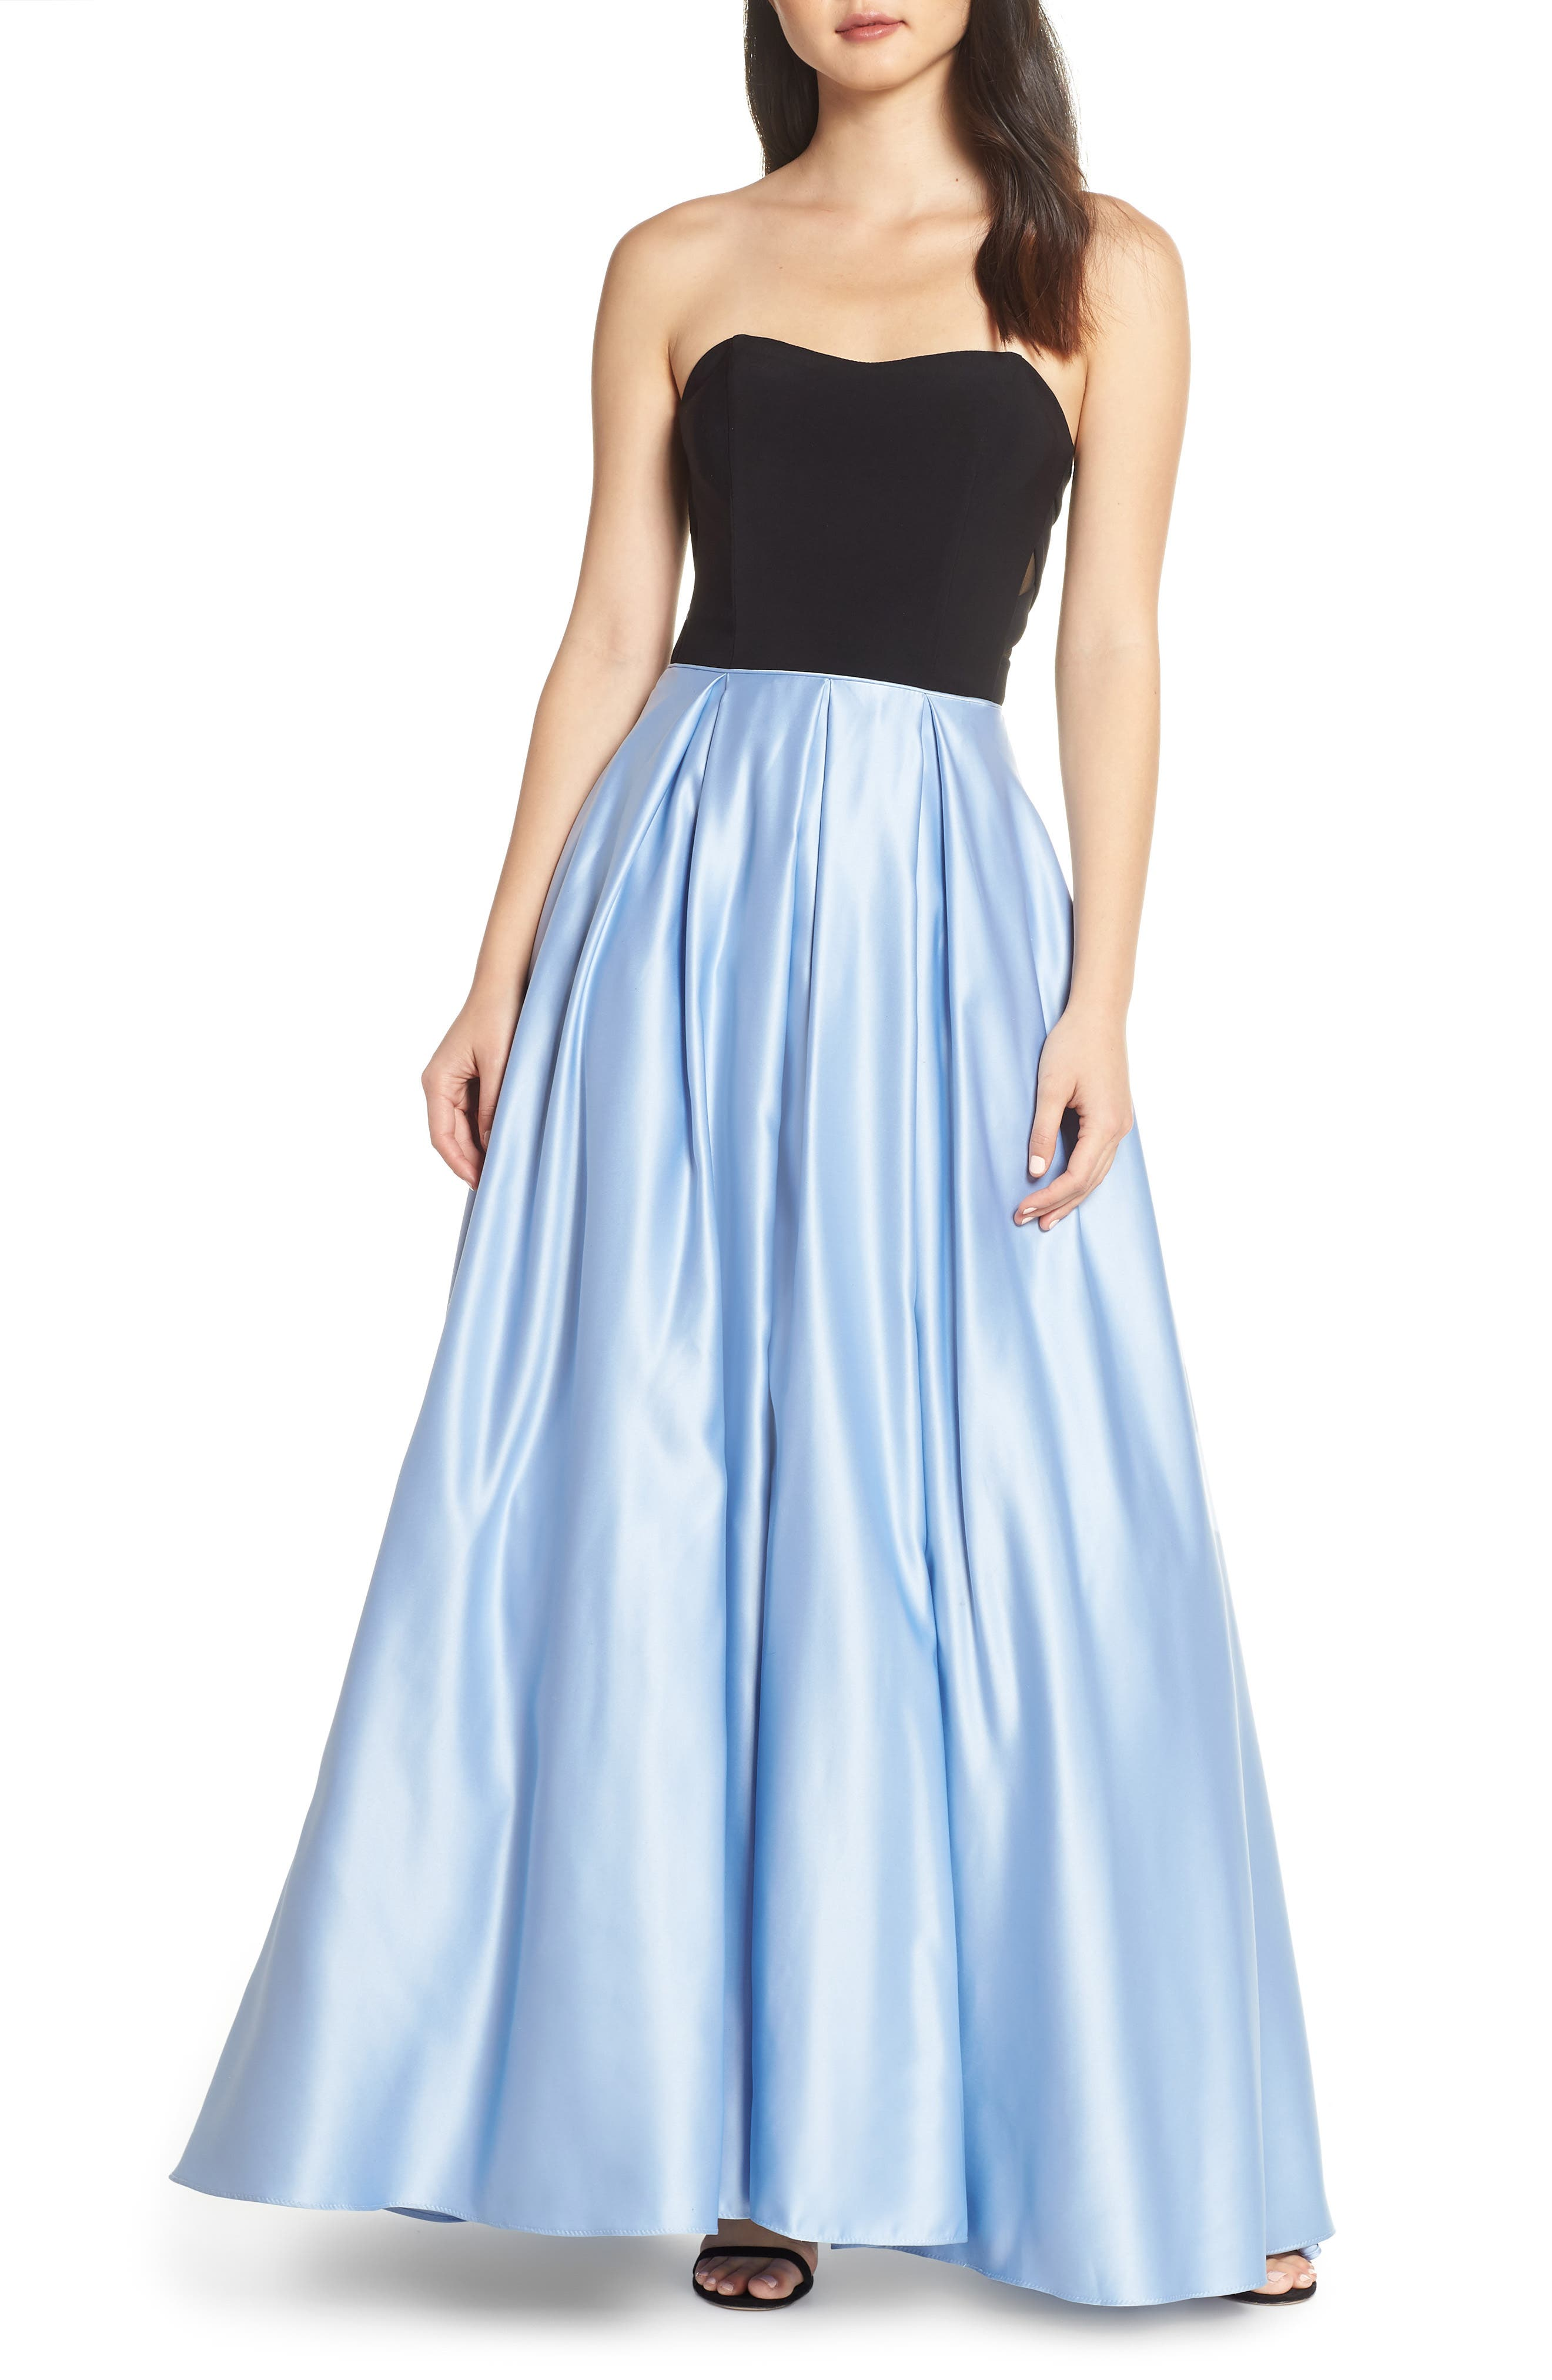 Blondie Nites Strapless Satin Skirt Evening Dress, Blue